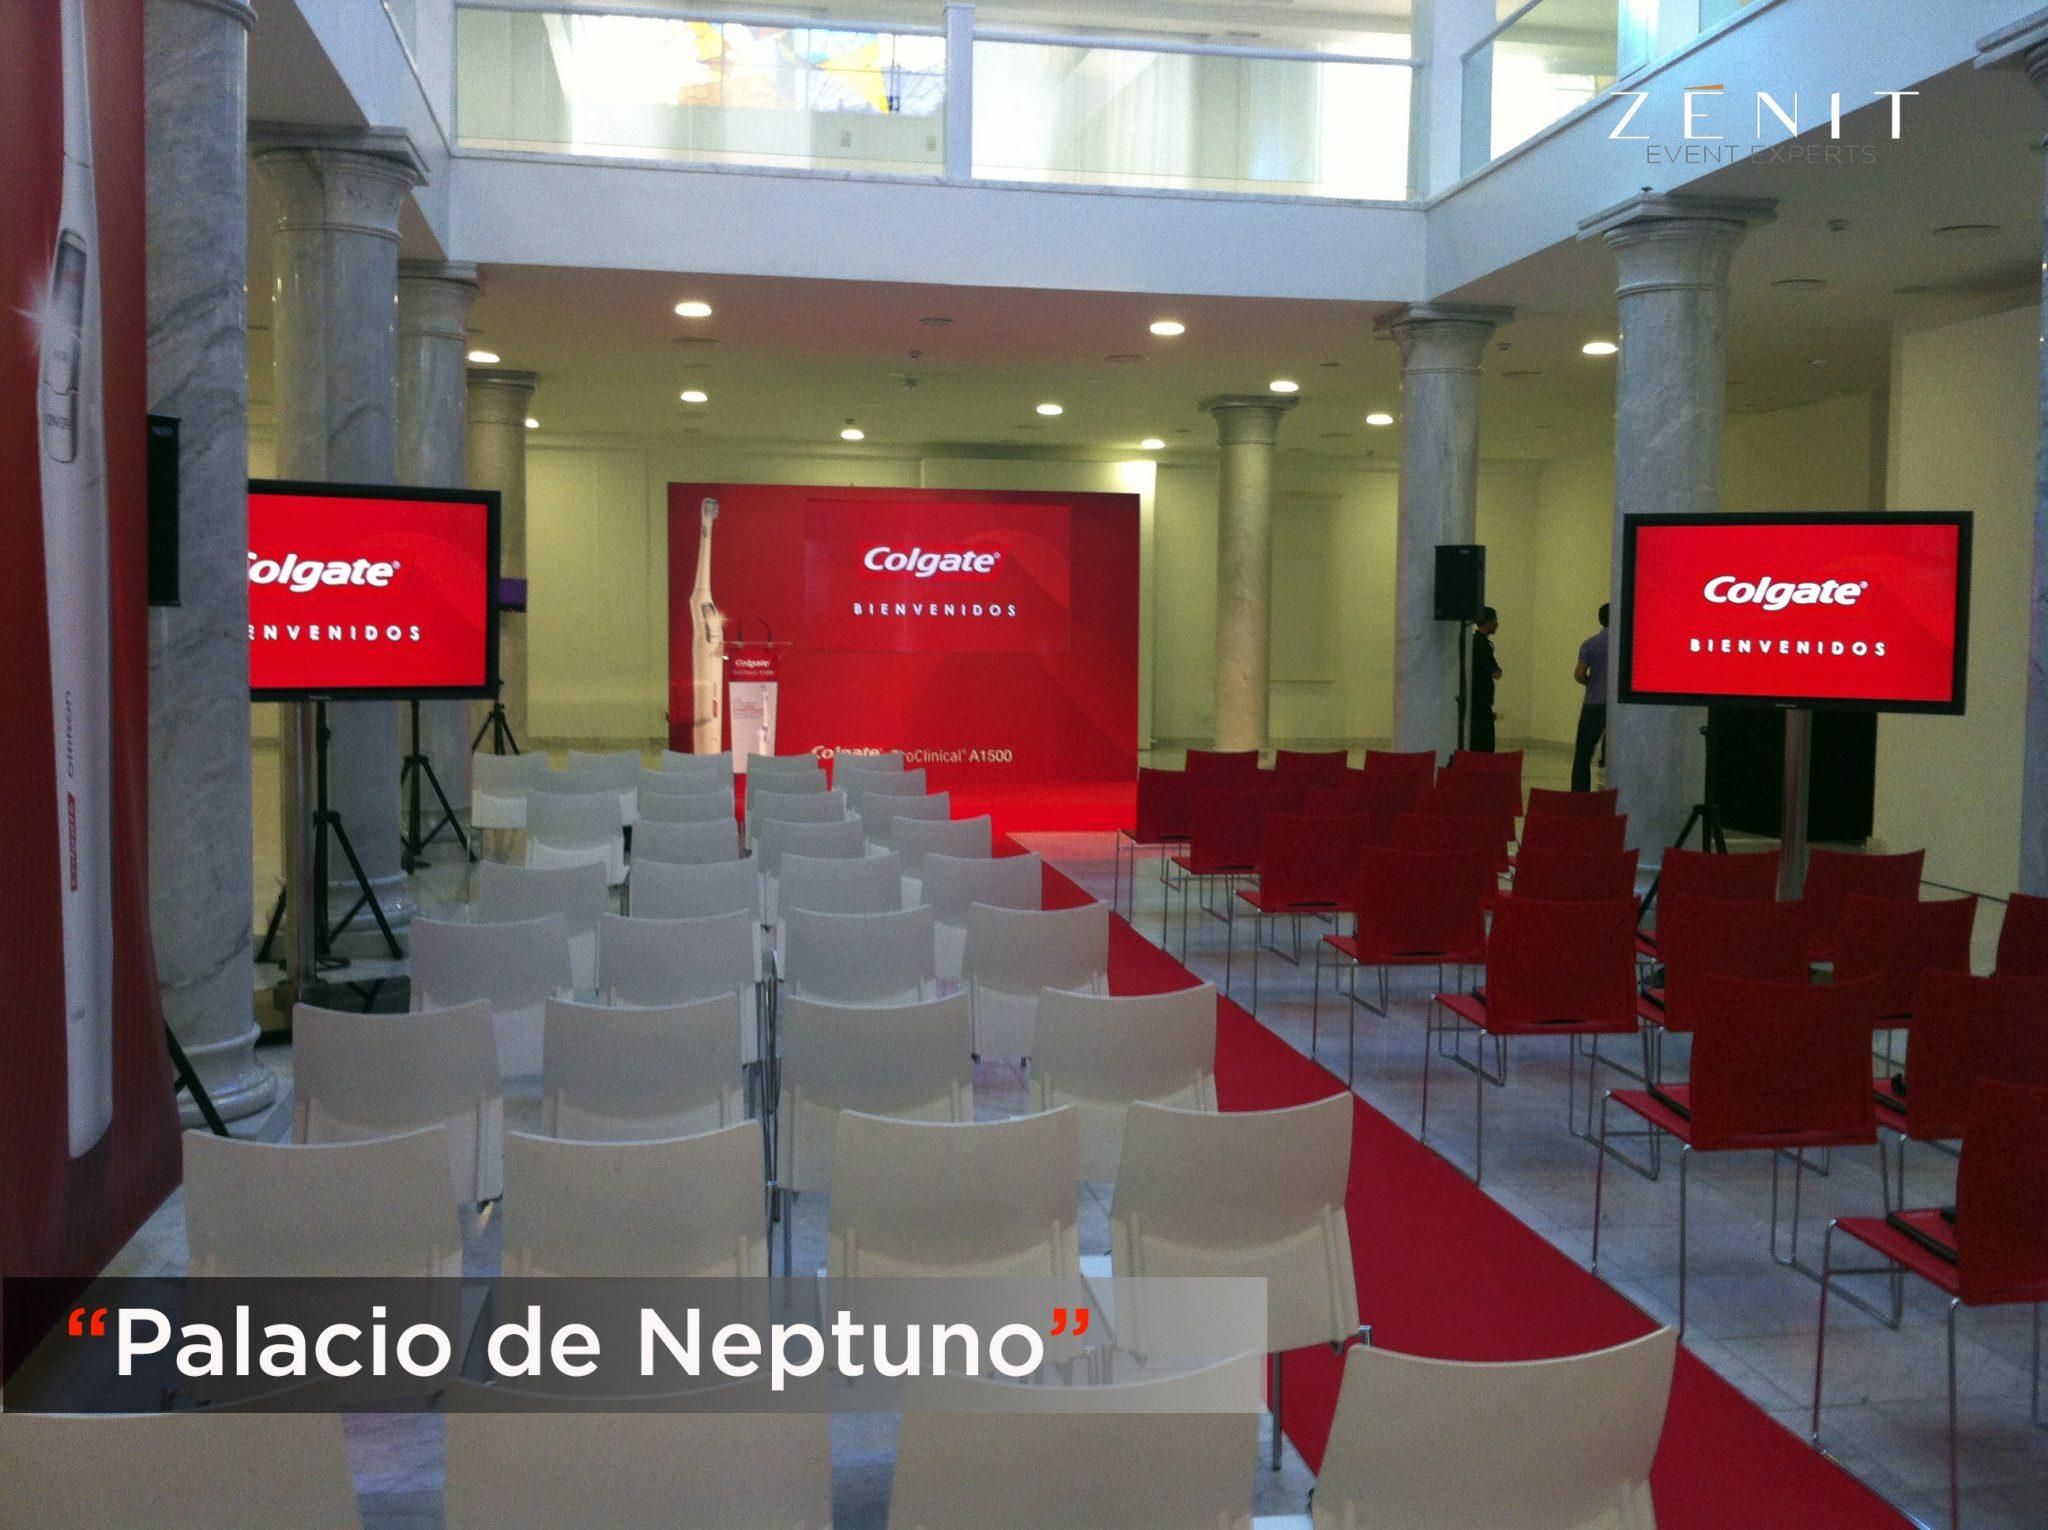 Zenit Event Experts. Palacio de Neptuno.